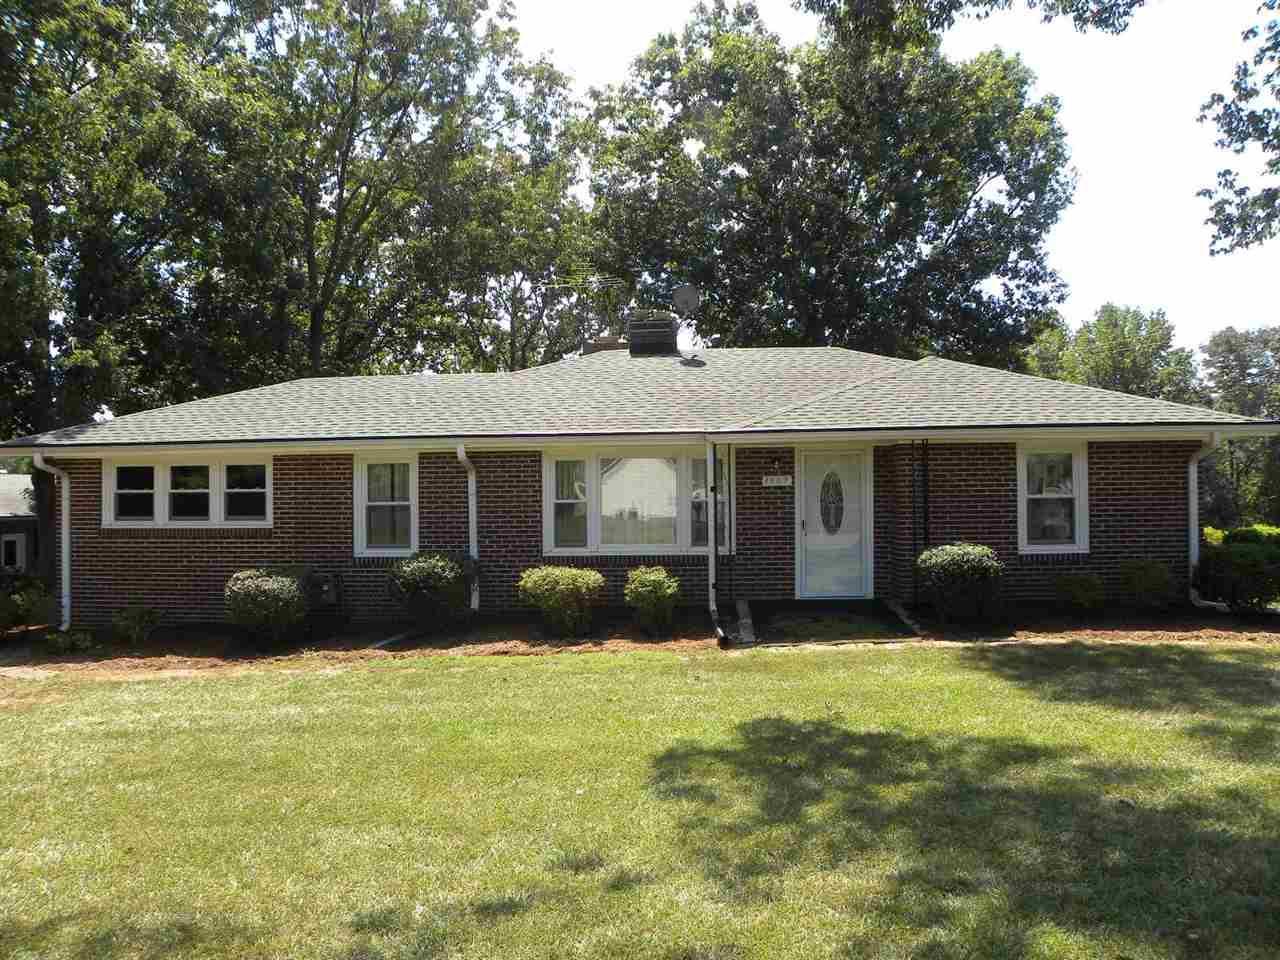 1507 Mcclellan Road, Anderson, SC 29621 (MLS #20162742) :: Les Walden Real Estate